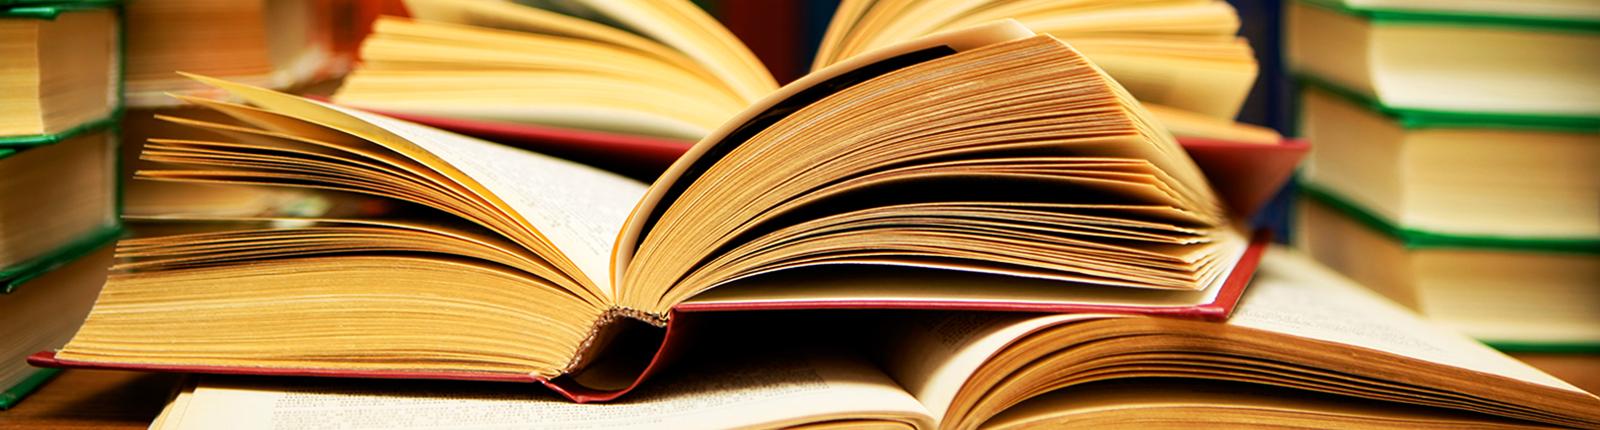 The-Scholars-Choice-Books